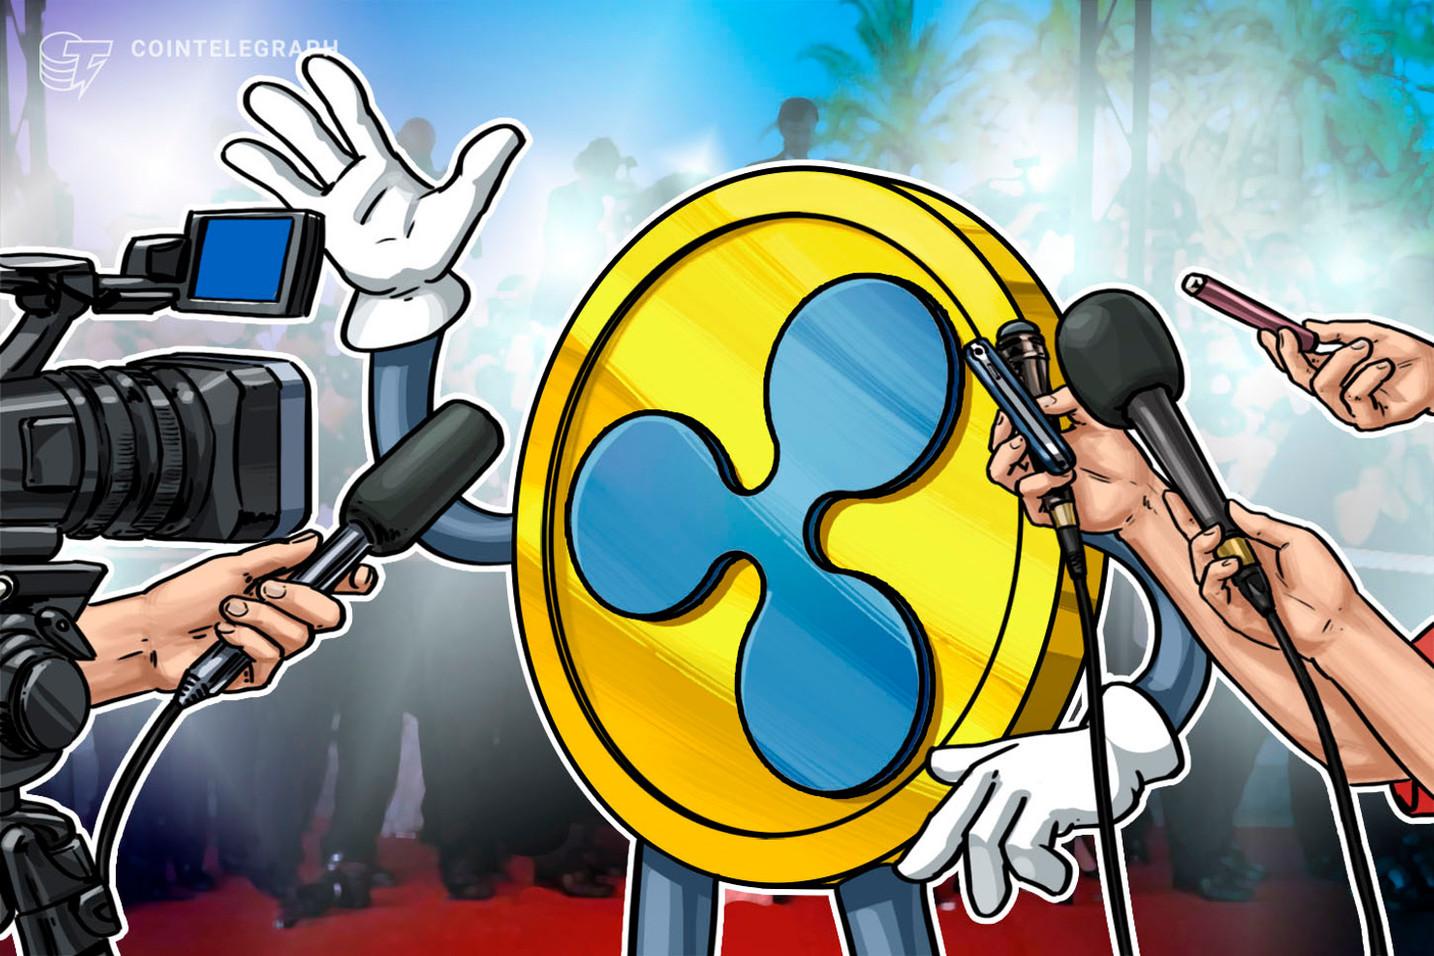 Ripple and MoneyGram to 'wind down' partnership